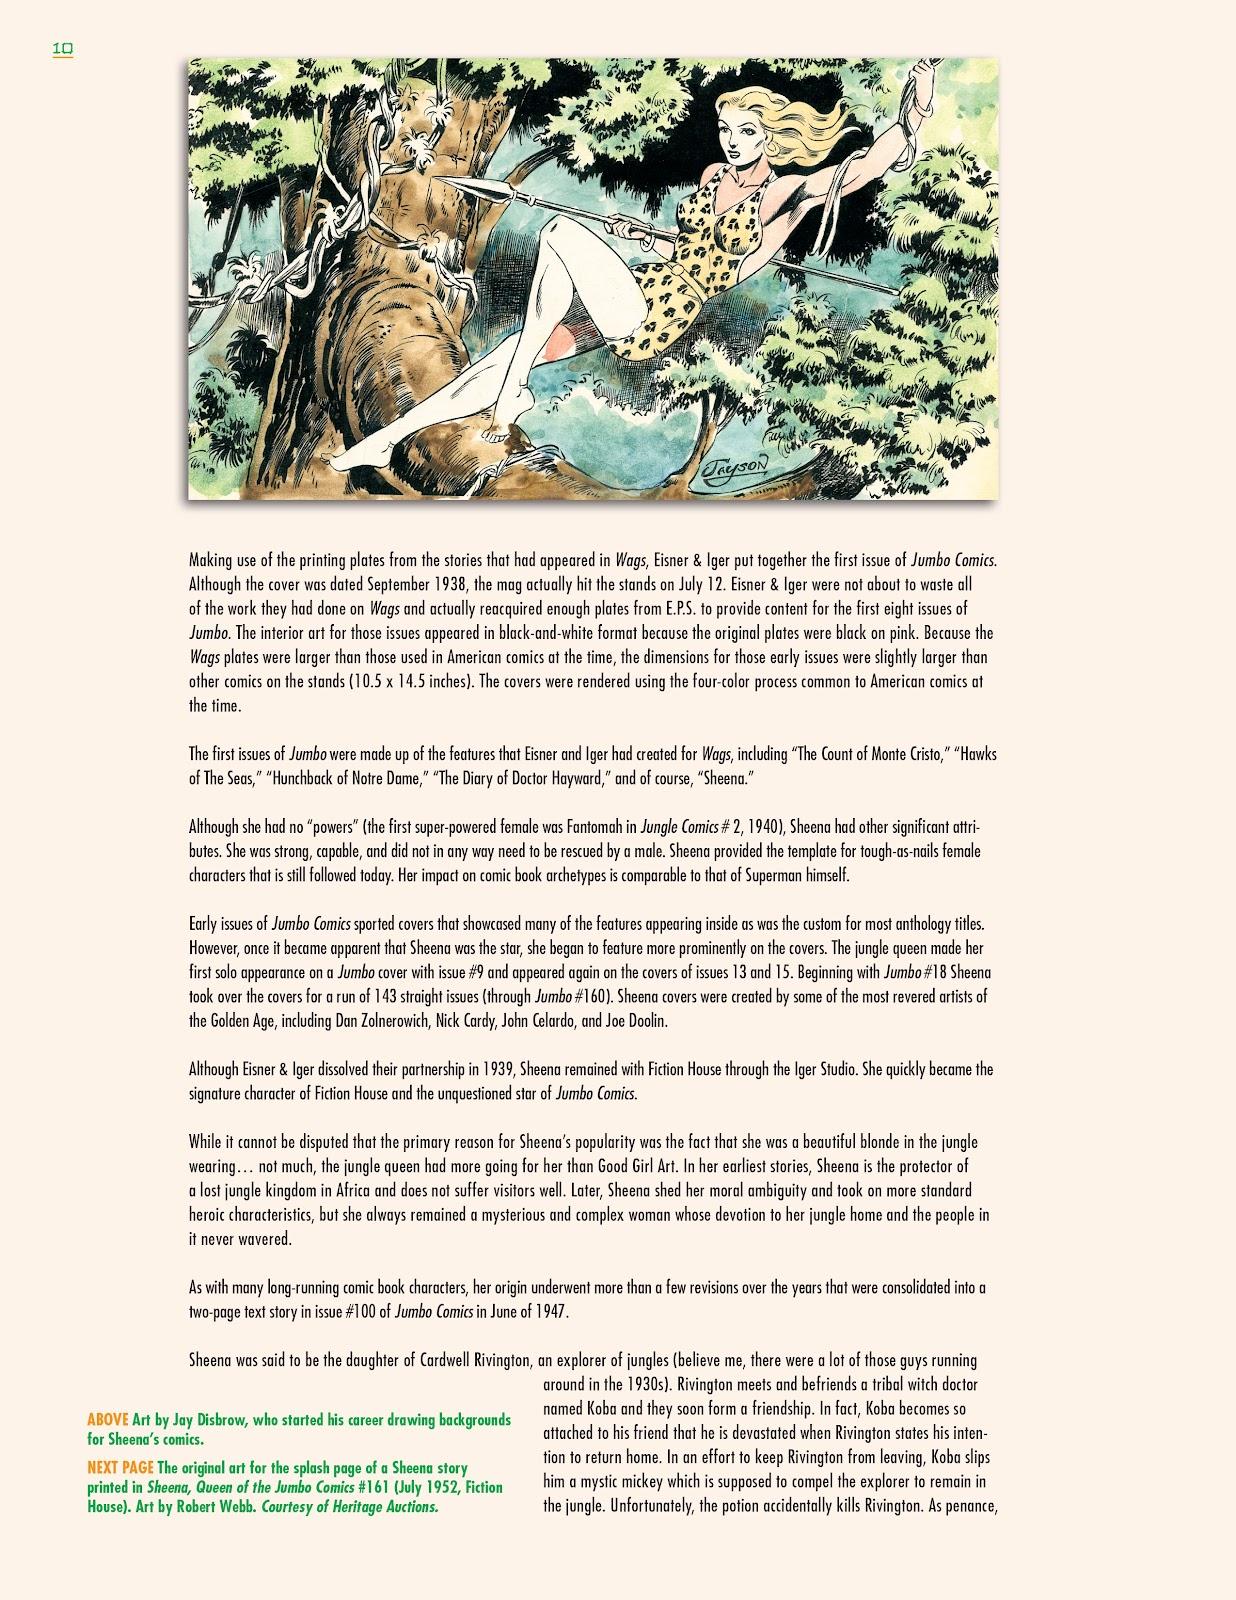 Read online Jungle Girls comic -  Issue # TPB (Part 1) - 12